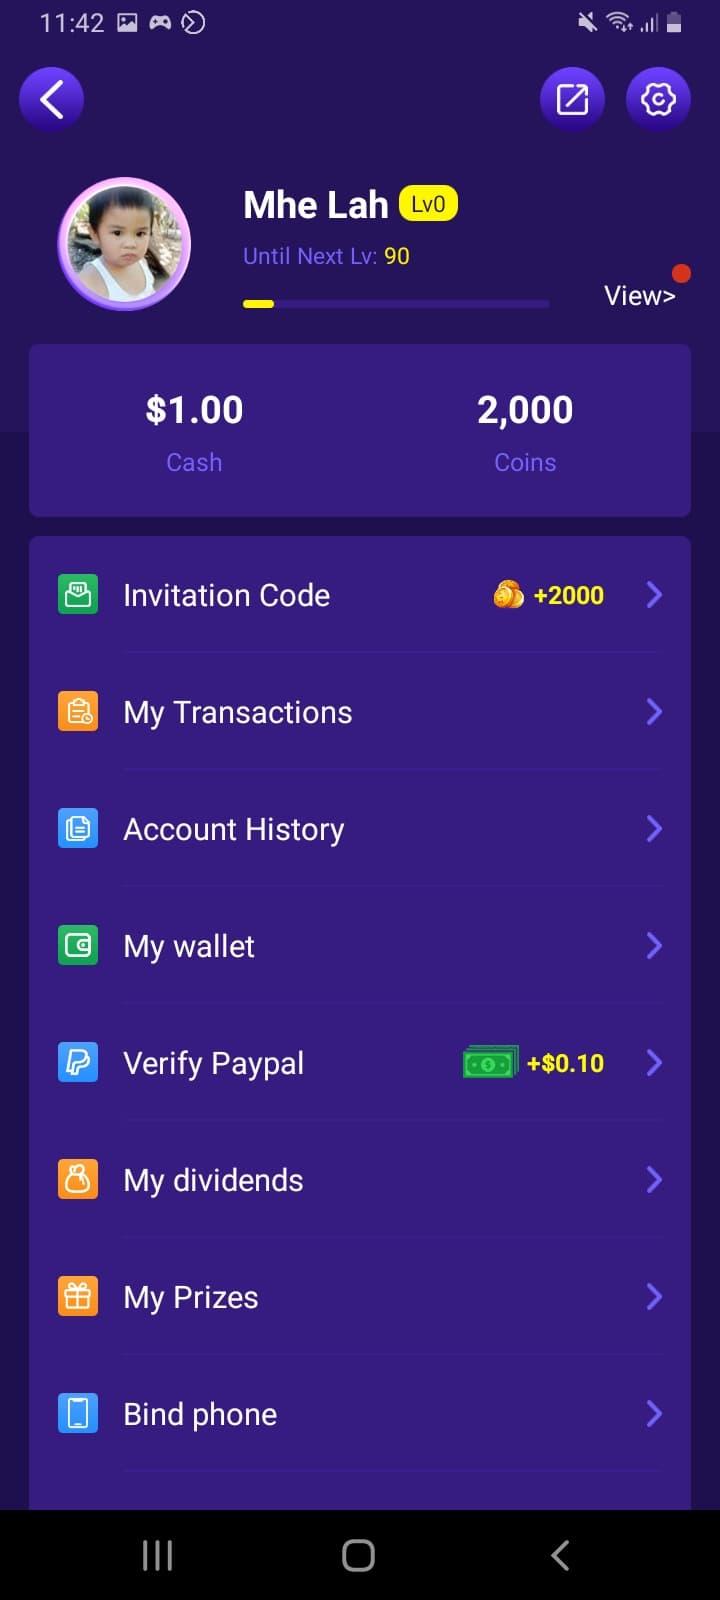 GoGoal App Review - Legit or Scam? $10 in Paypal 3